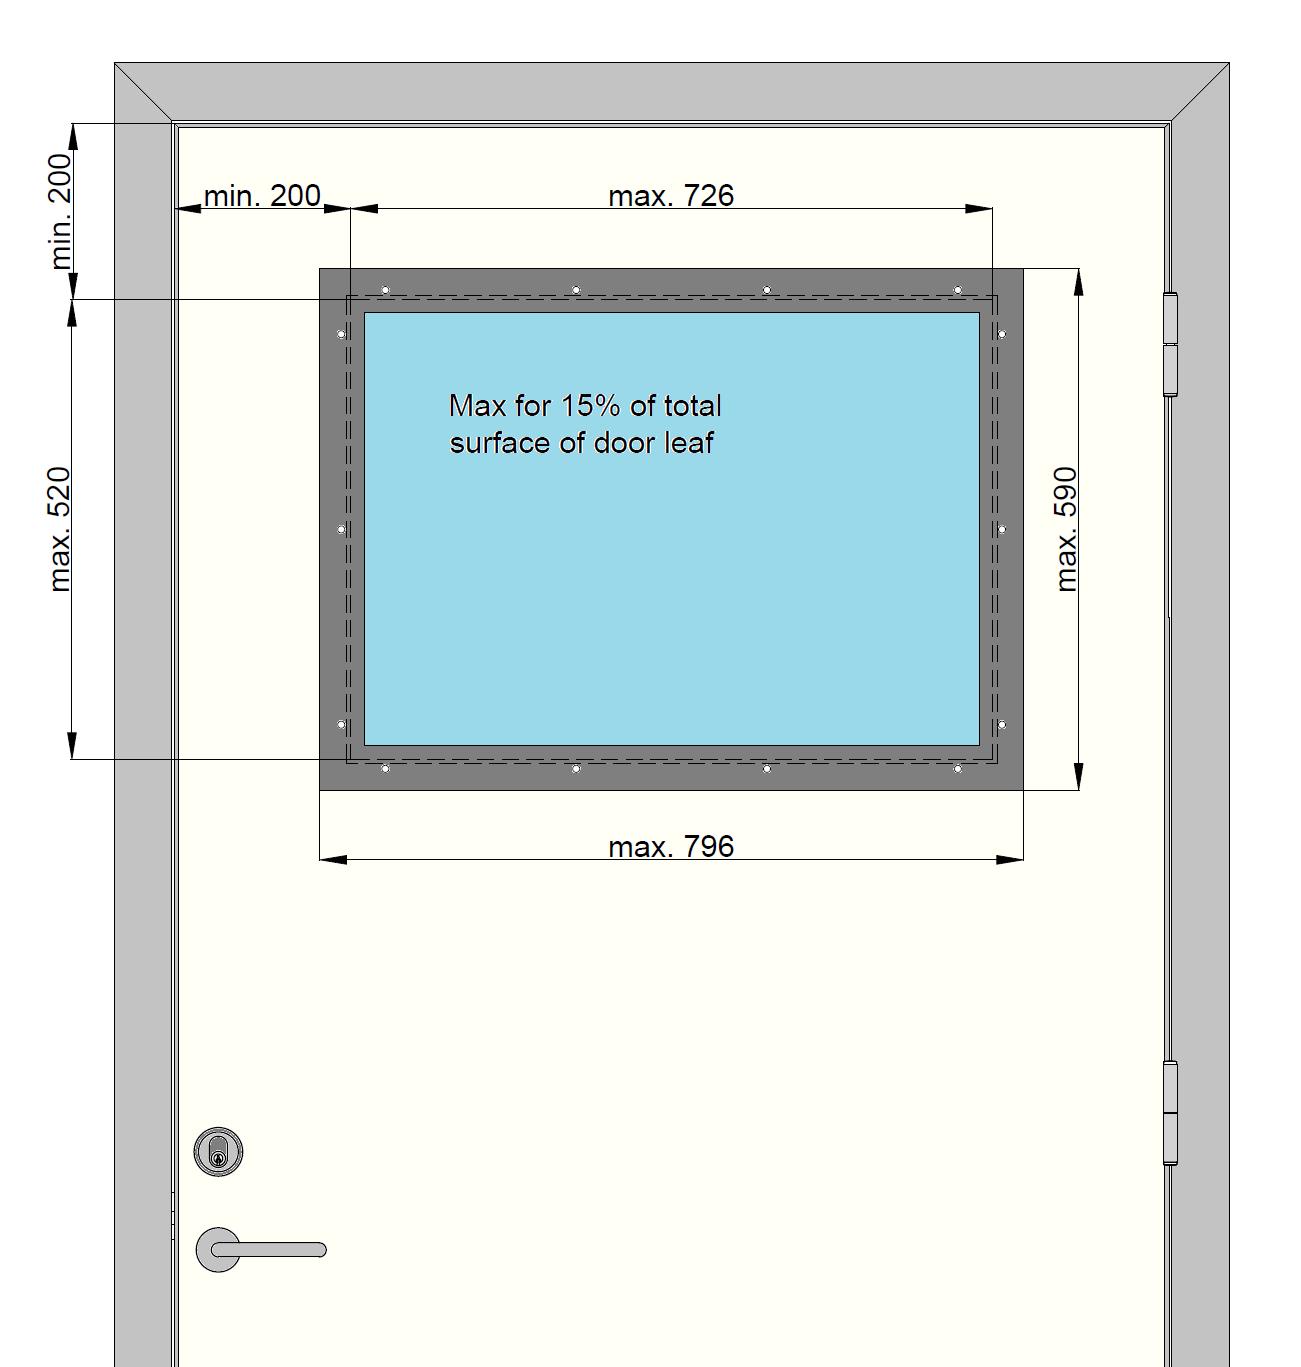 BD30 vindue til vådrumsdør